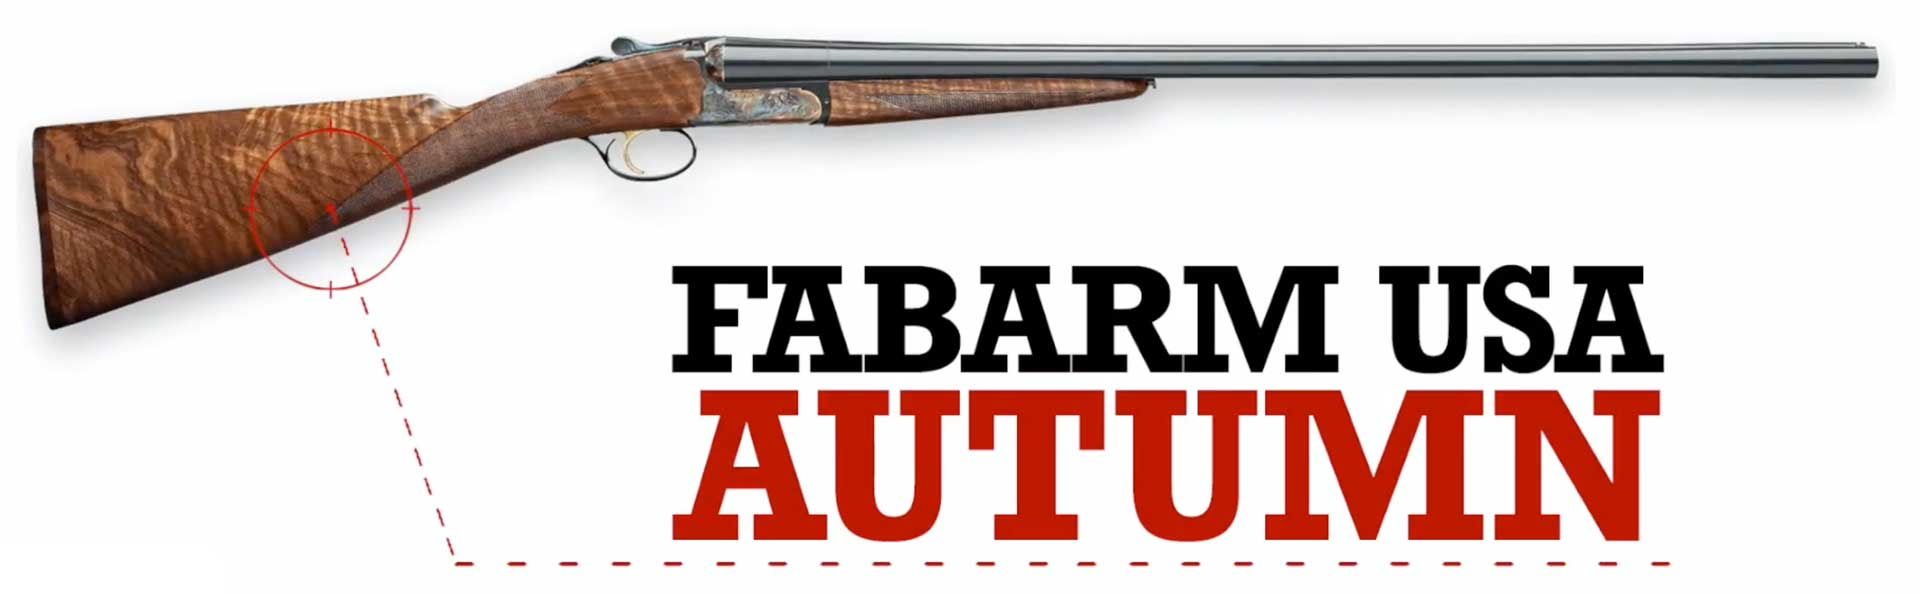 "right side shotgun walnut wood metal gun text on image noting ""Fabarm USA Autumn"""